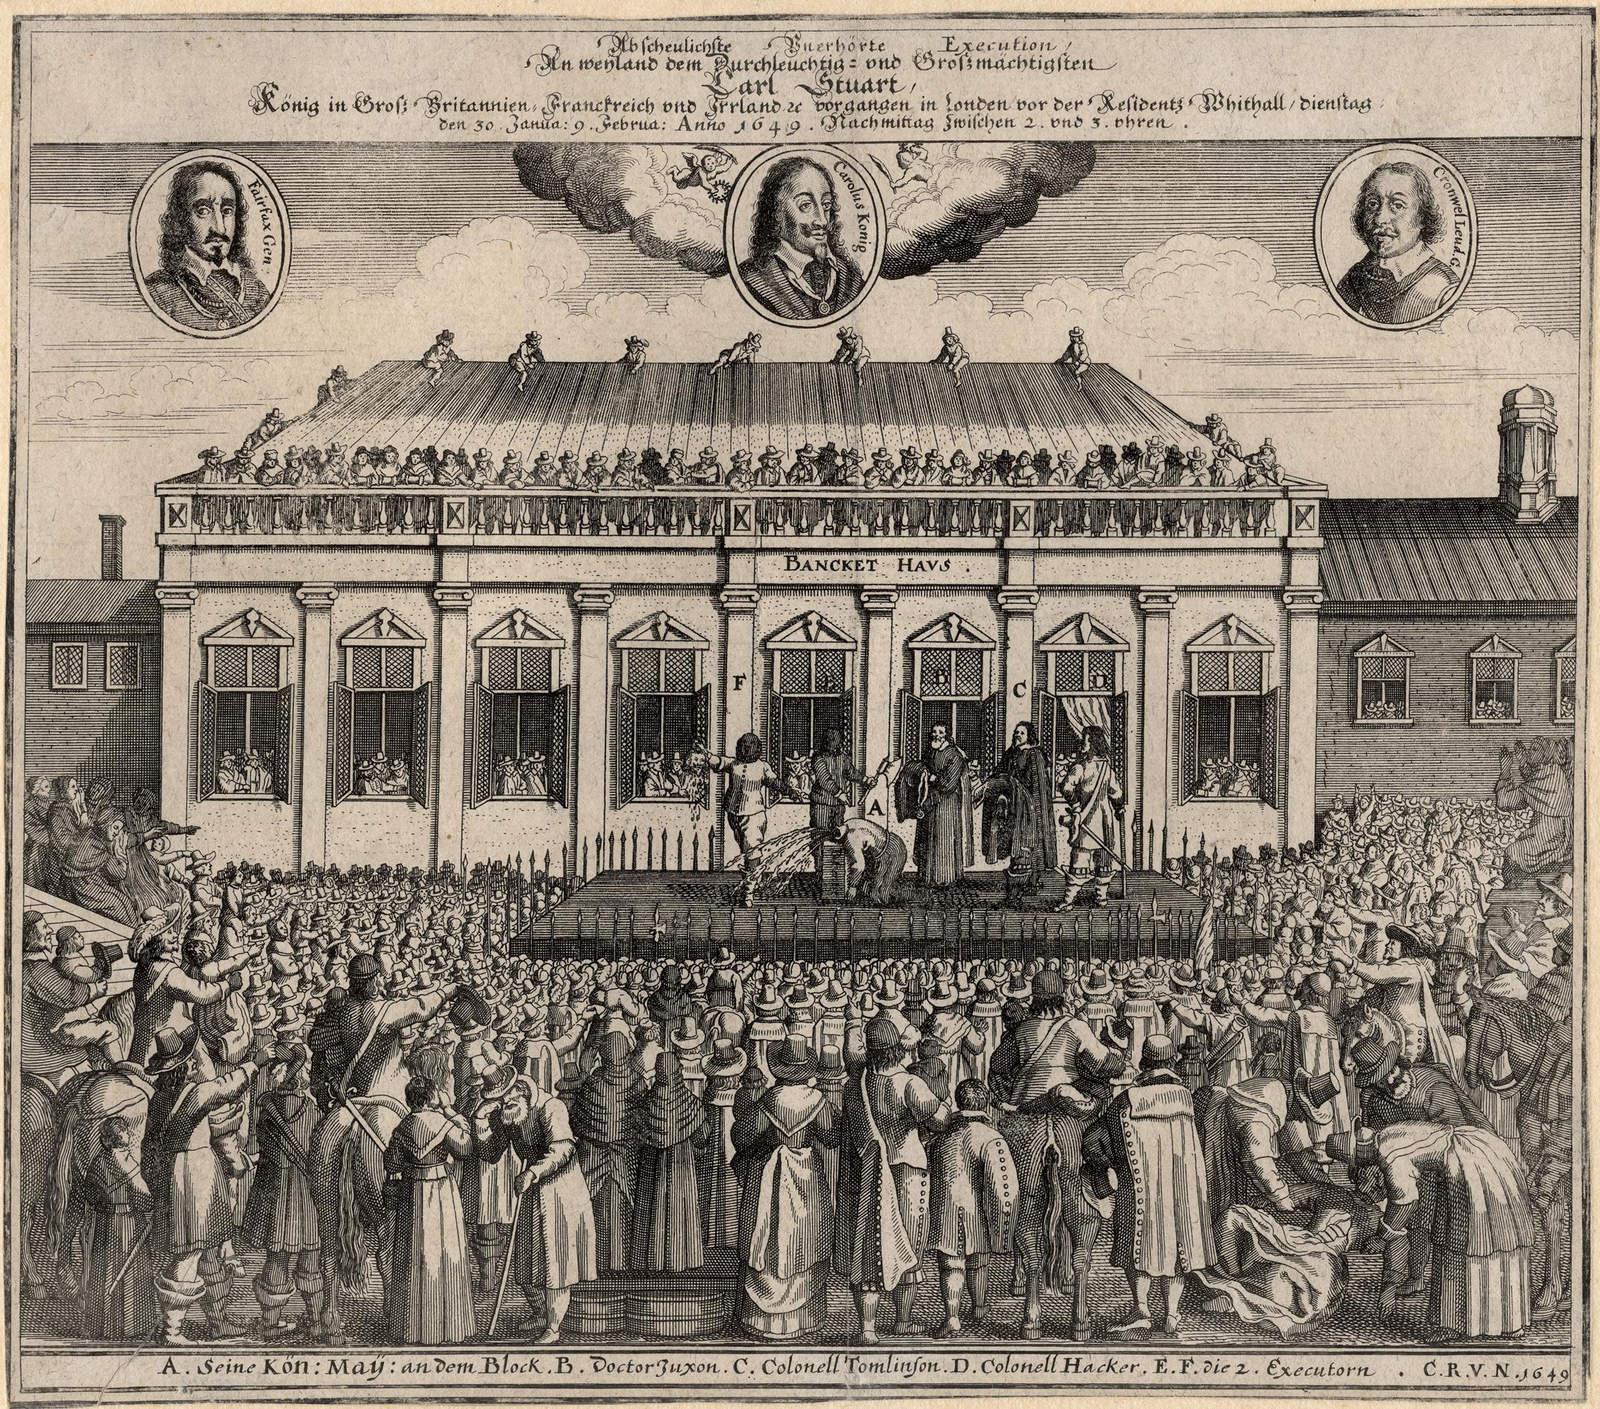 1649-01-30.King.Charles.execution.jpg